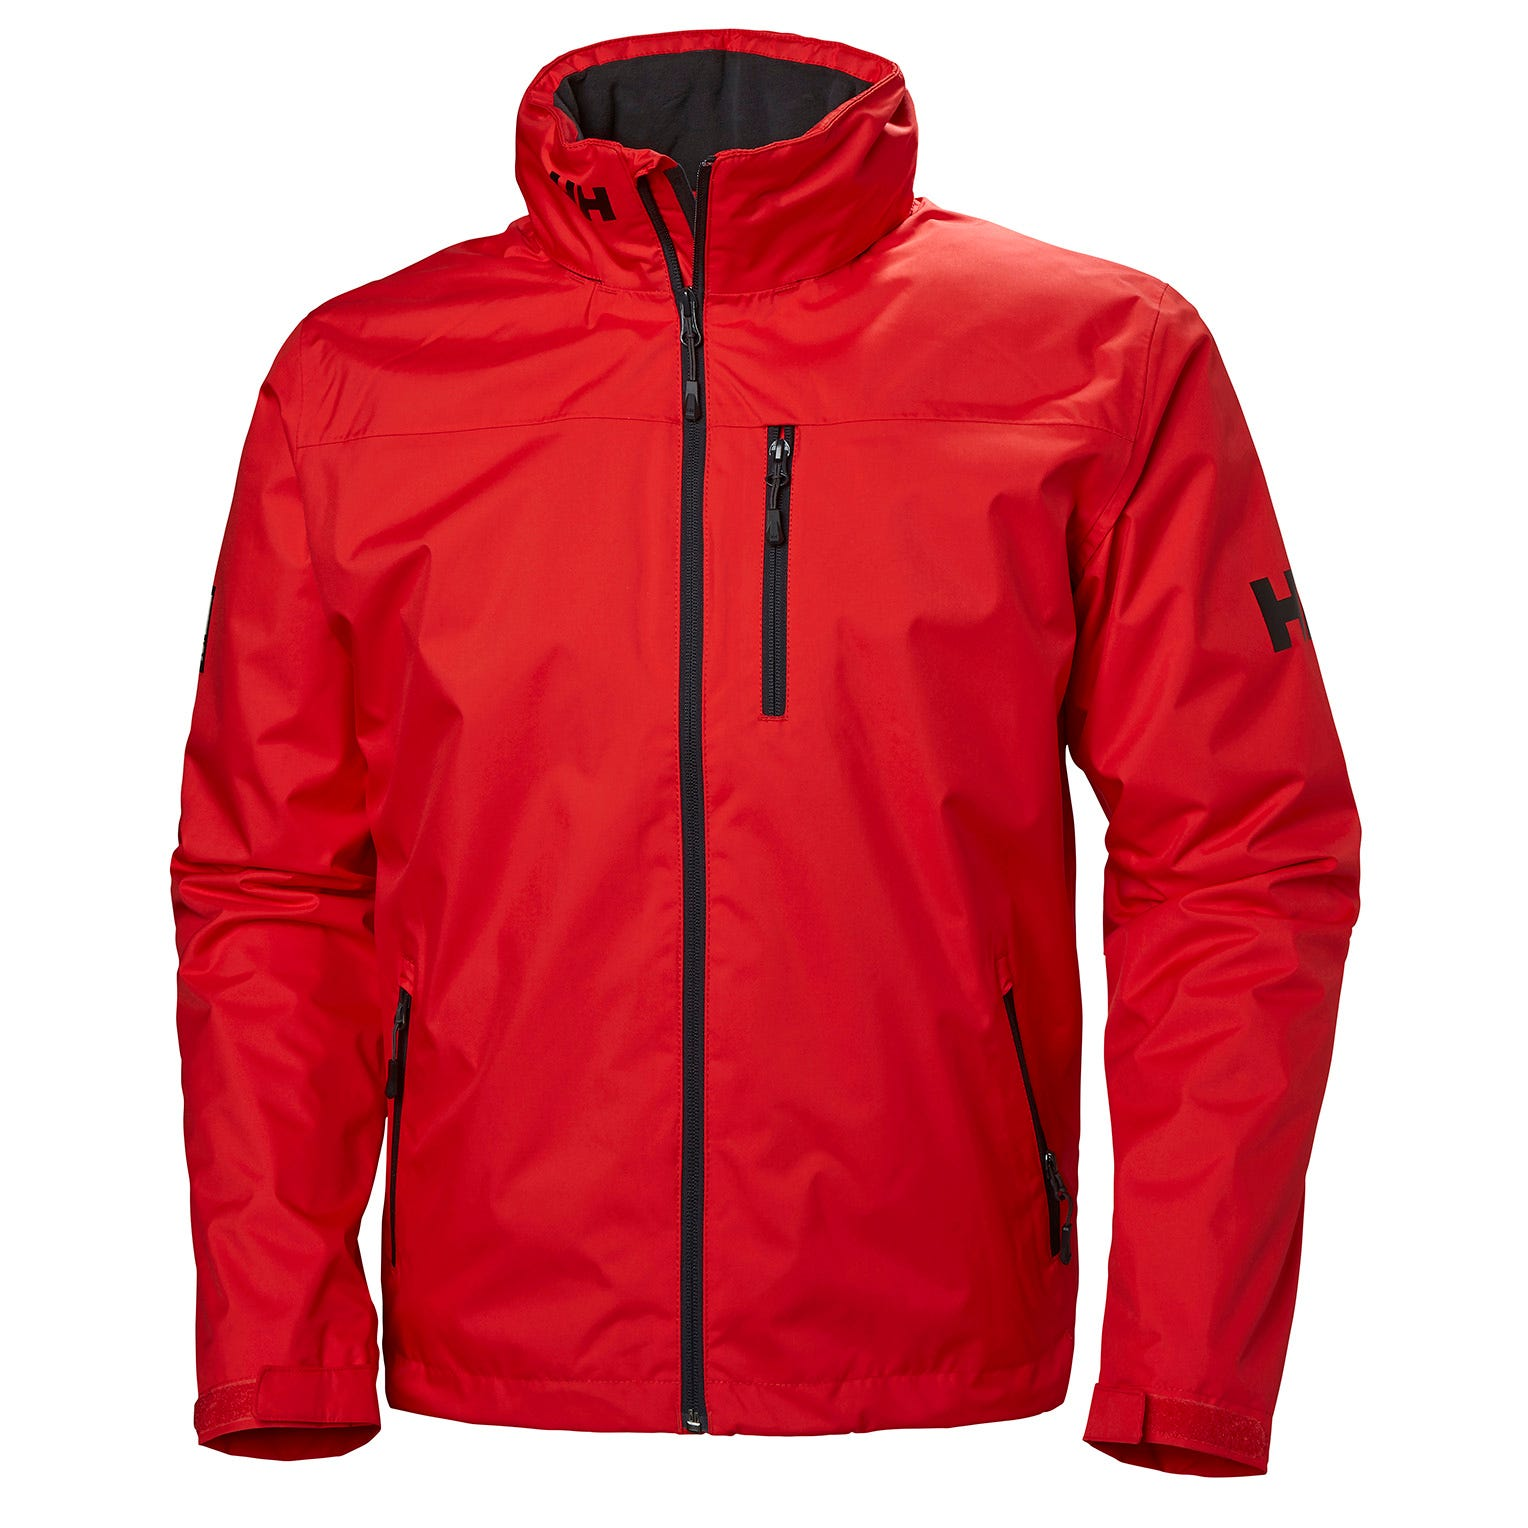 Helly Hansen Mens Sailing Jacket Red L